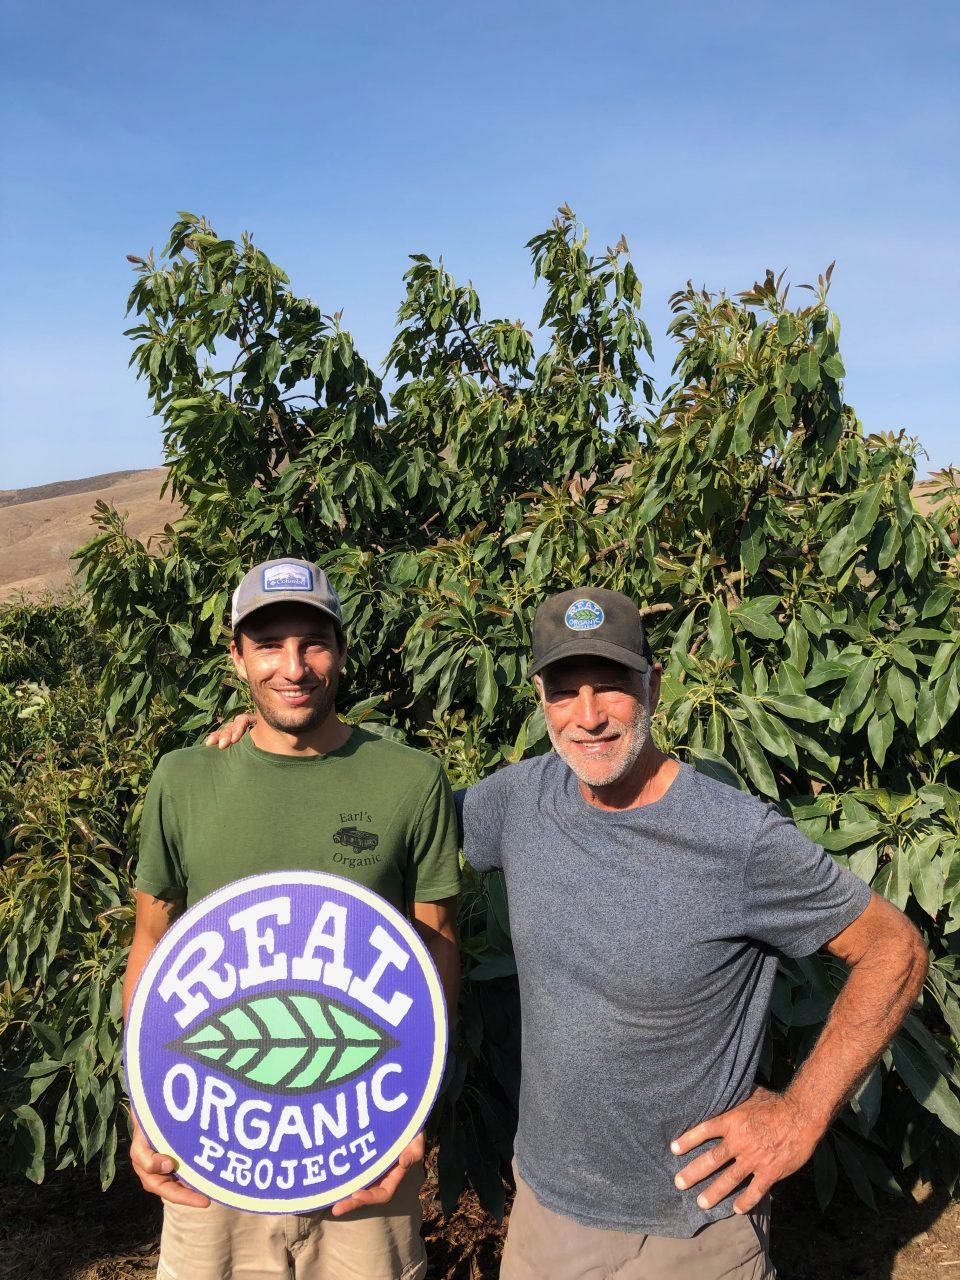 Real Organic Nutri Fit